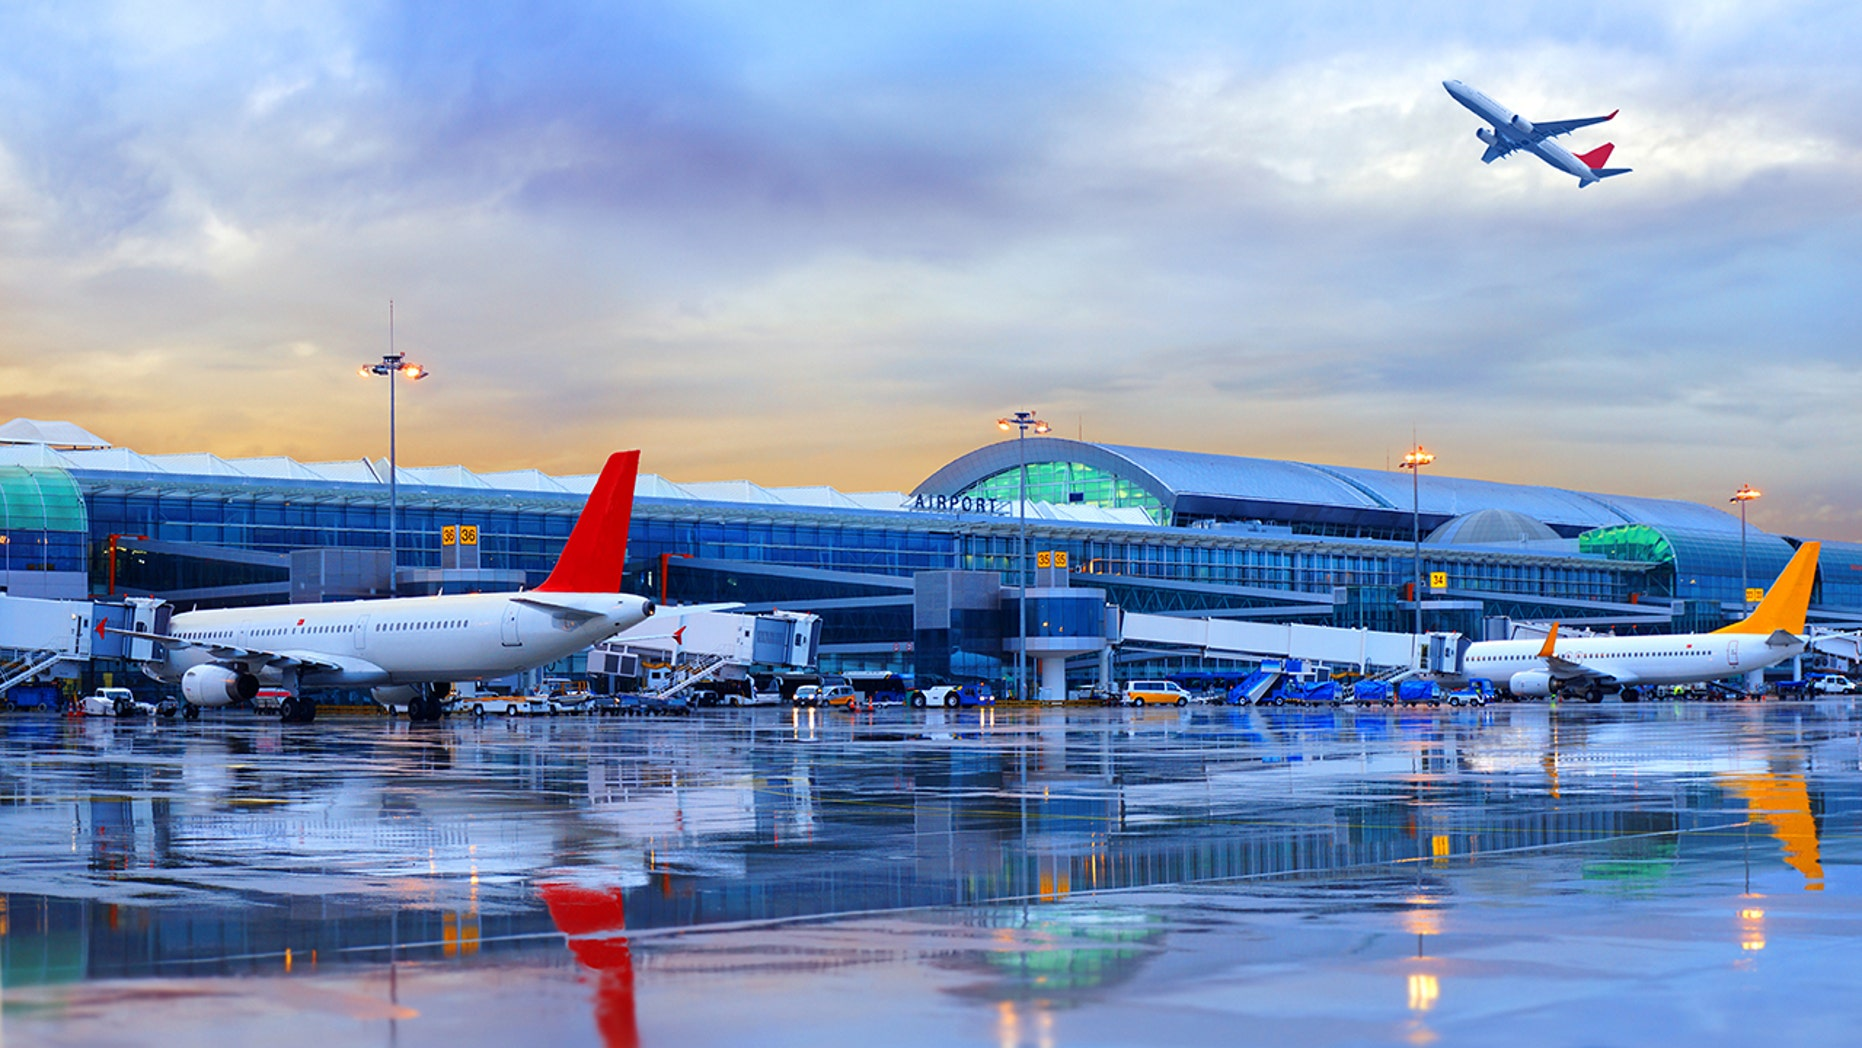 Airport in Ä°zmir, Turkey ( Adnan Menderes Airport )